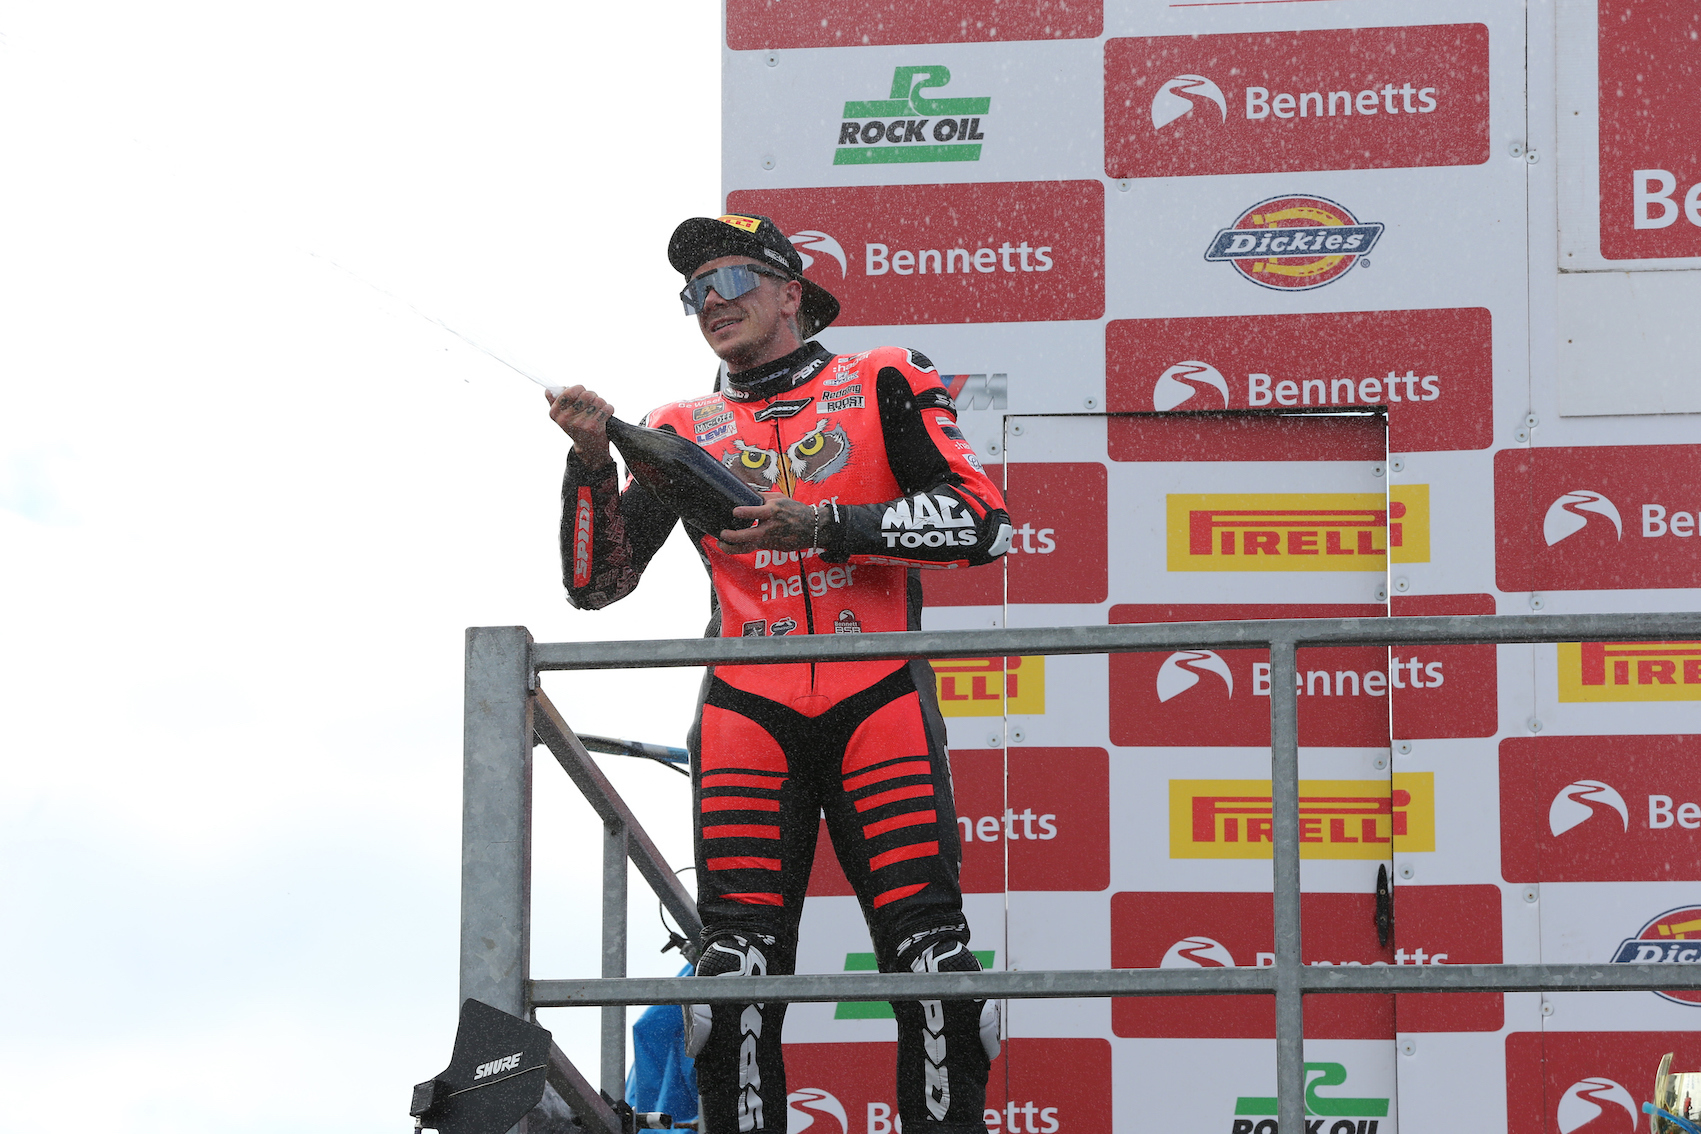 Scott Redding celebrating race win at BSB